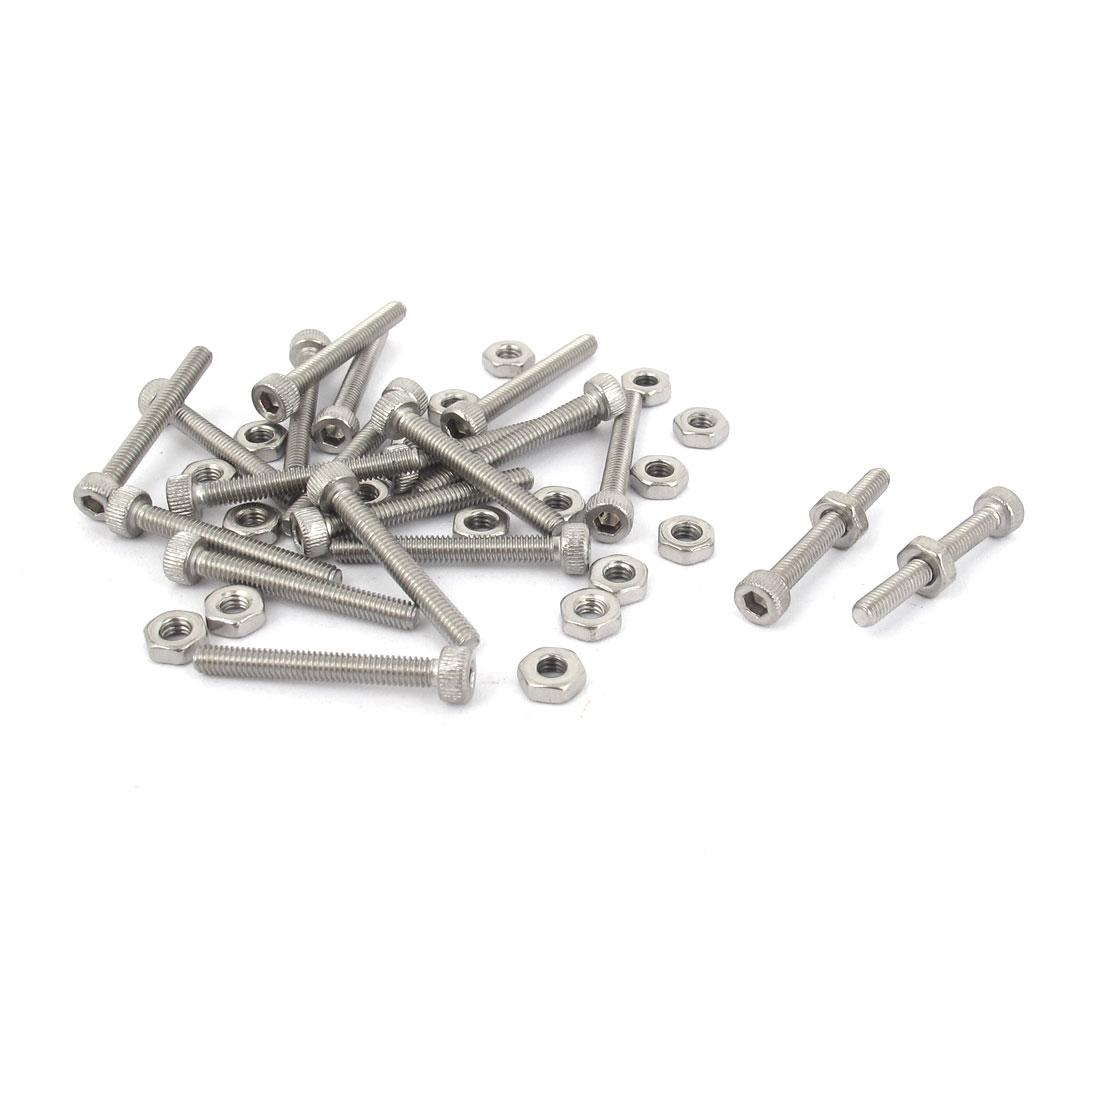 M2.5x20mm Stainless Steel Hex Socket Head Knurled Cap Screws Bolts Nut Set 20Pcs